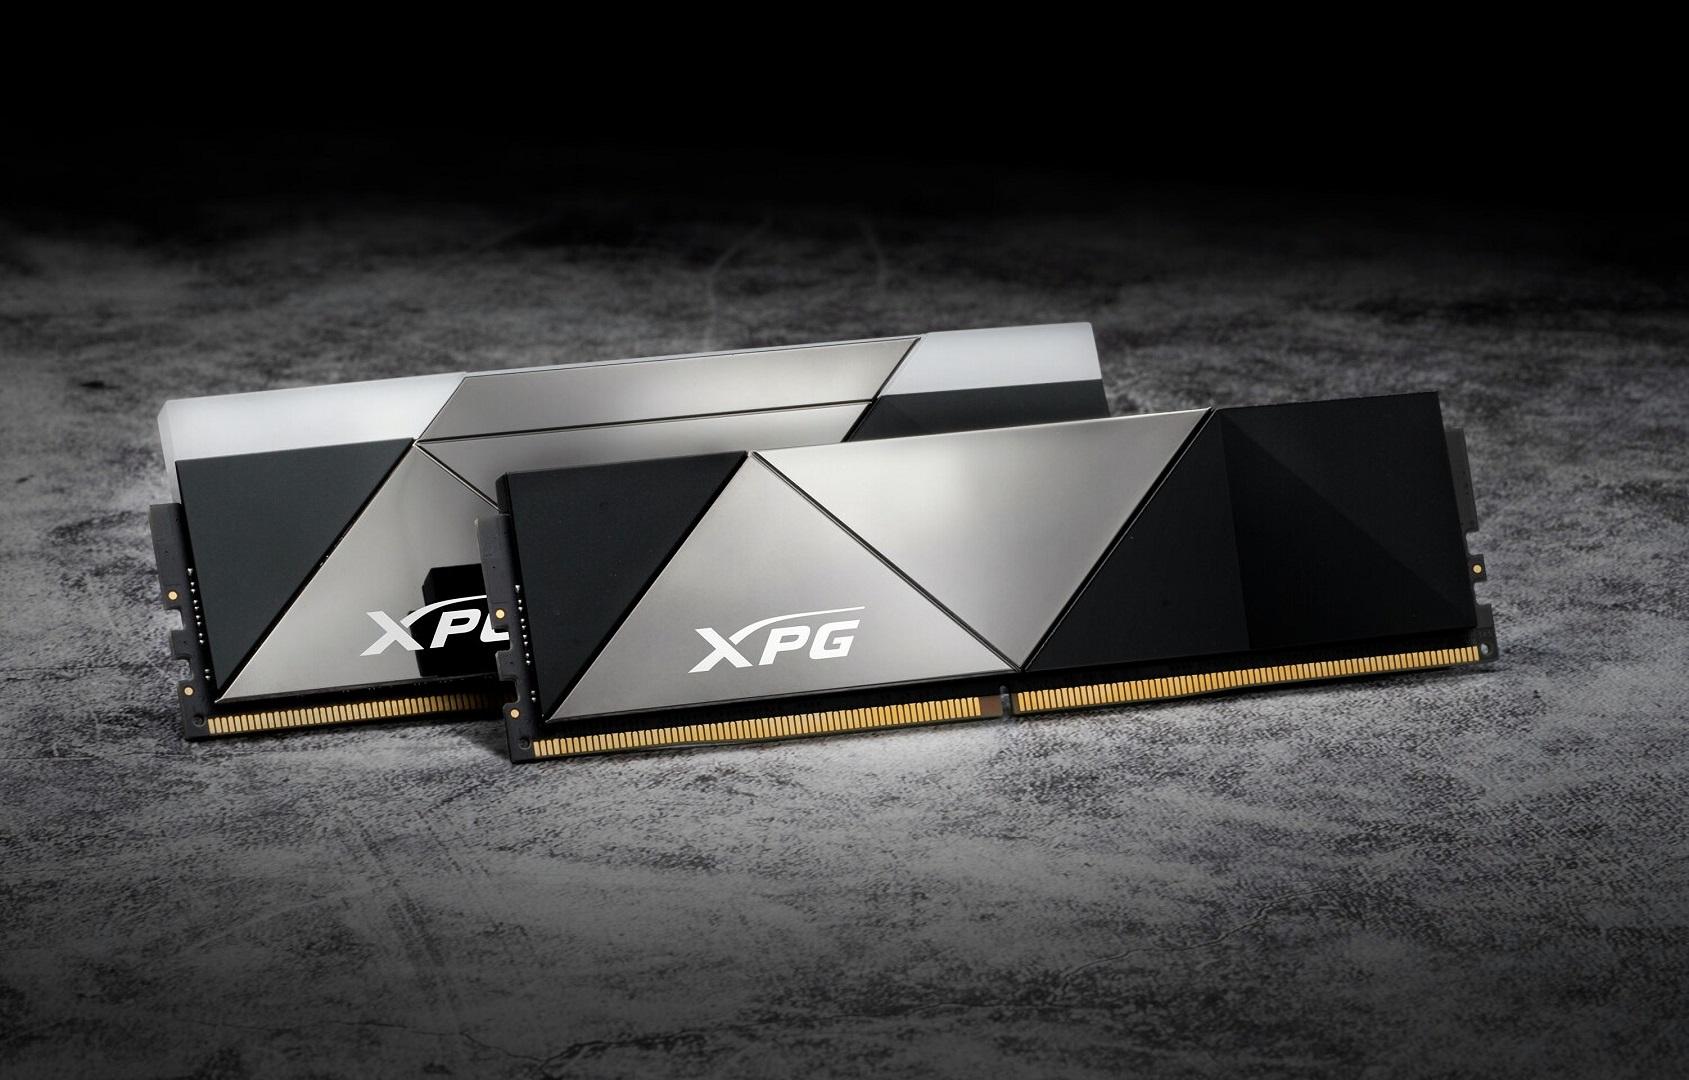 XPG Caster DDR5 RAM 3 (1)